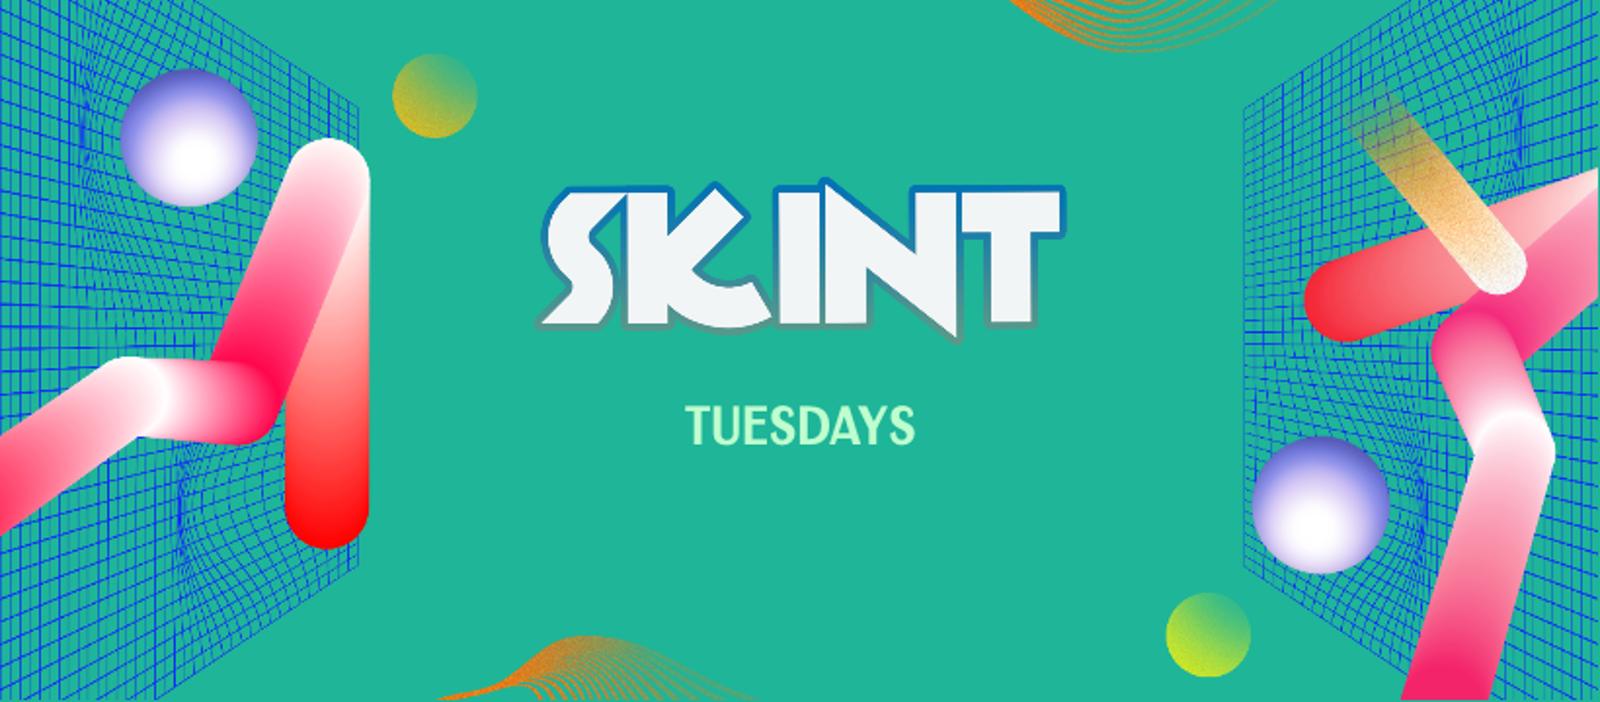 Seated Skint Tuesdays